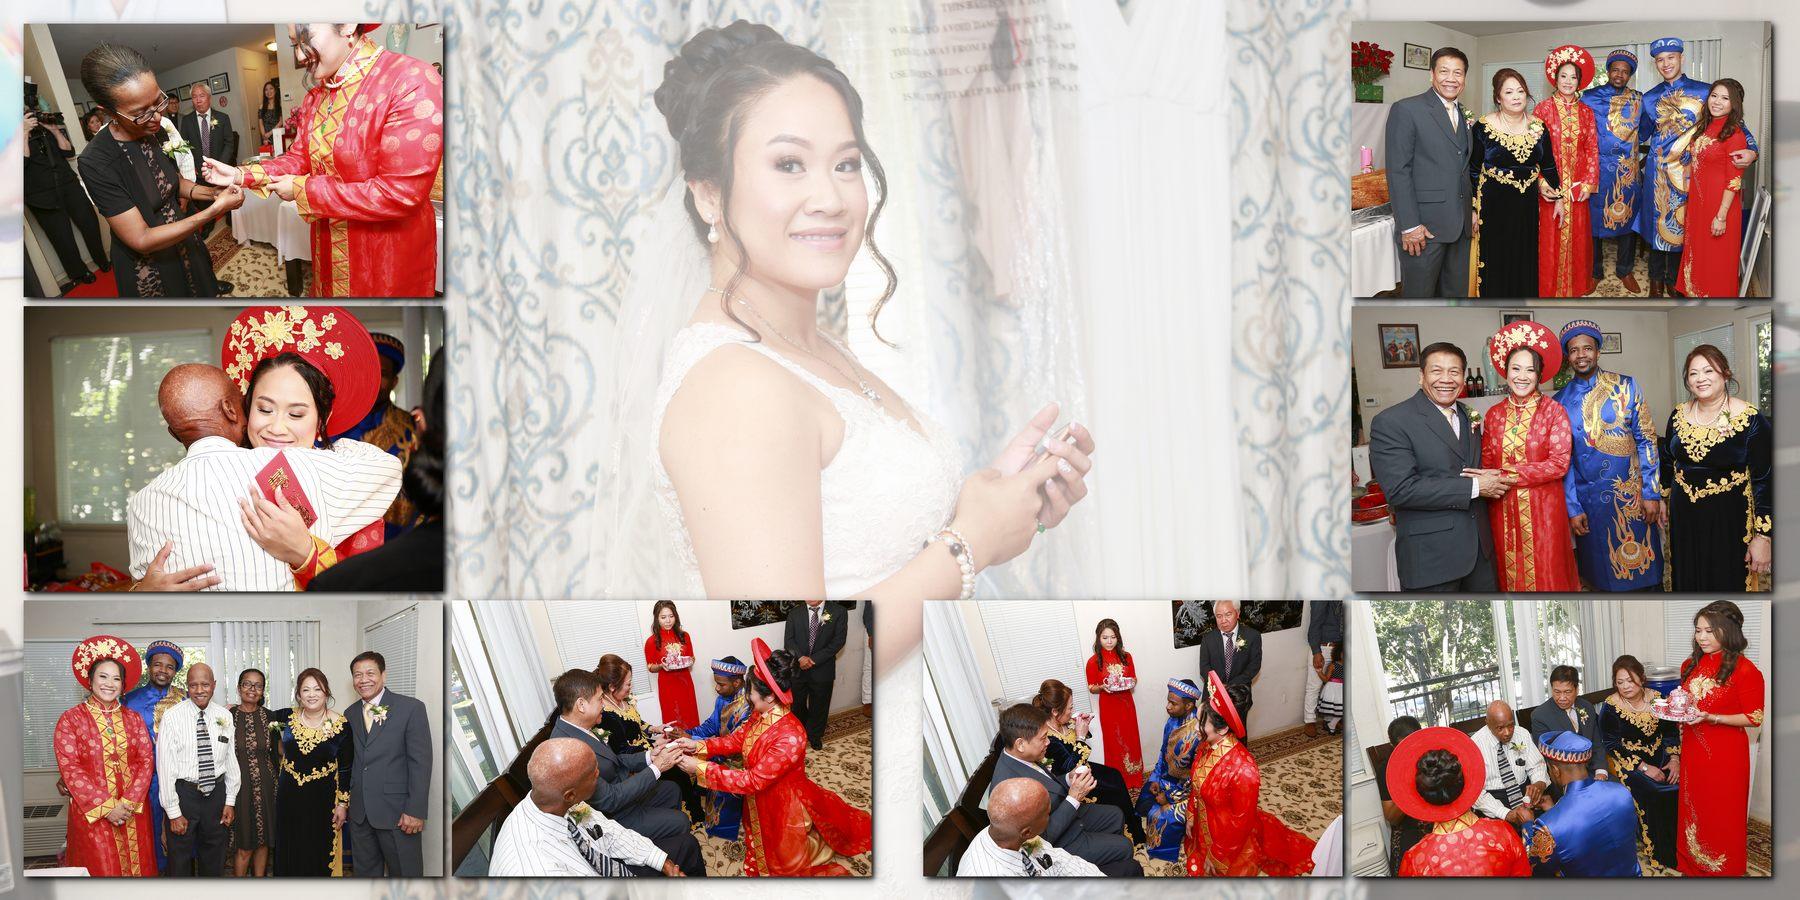 Keneisha wedding album 004 (Sides 6-7)